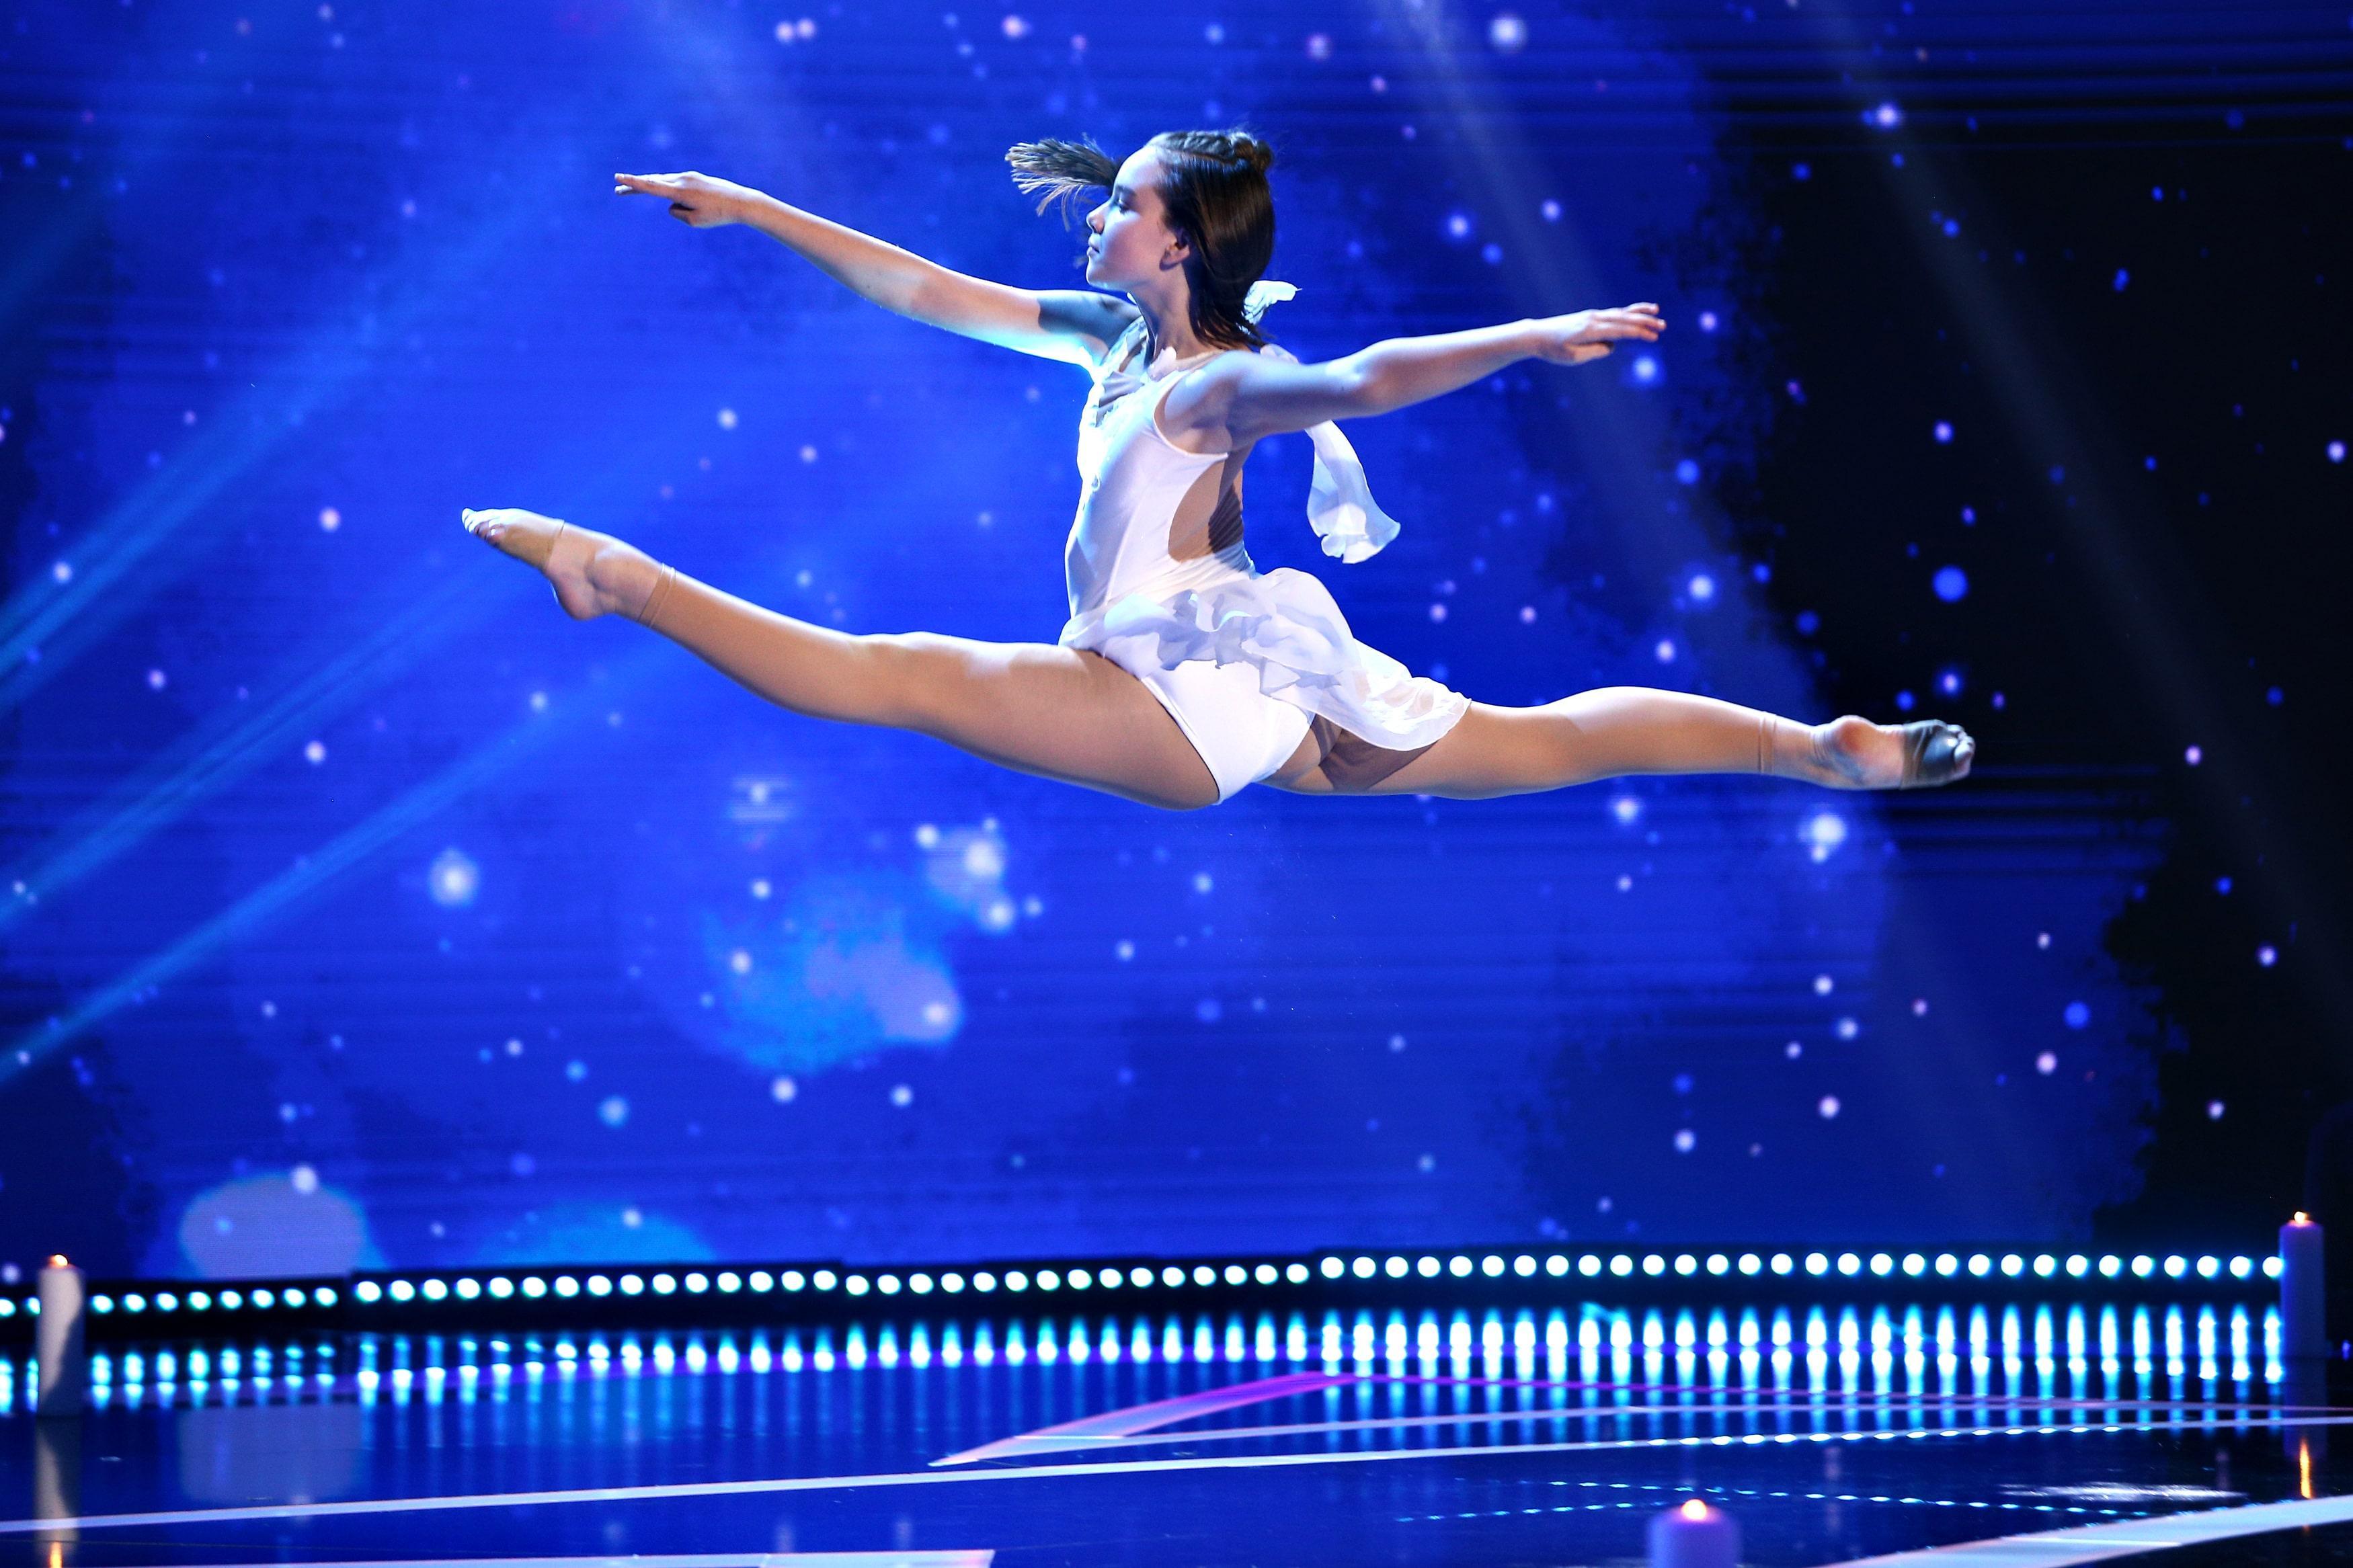 Next Star, 26 iunie 2021. Vanessa Bondor, moment de balet și gimnastică. Nadia Comăneci i-a transmis câteva cuvinte